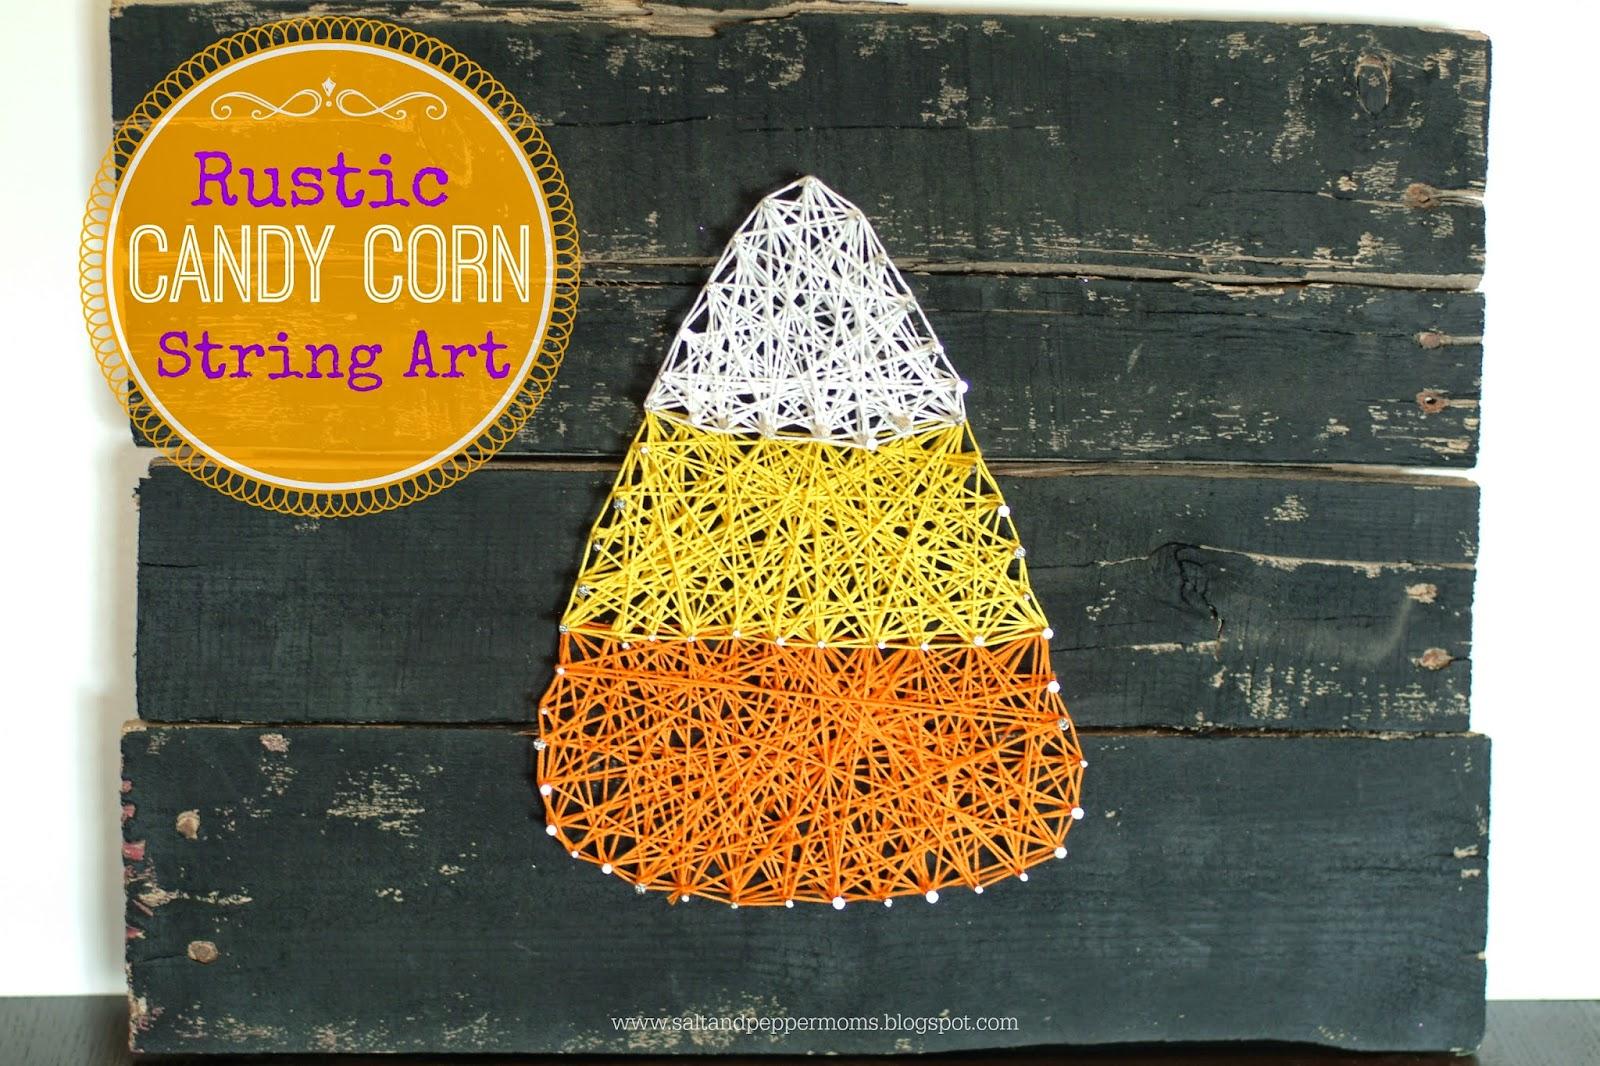 http://saltandpeppermoms.blogspot.com/2014/09/rustic-candy-corn-string-art.html